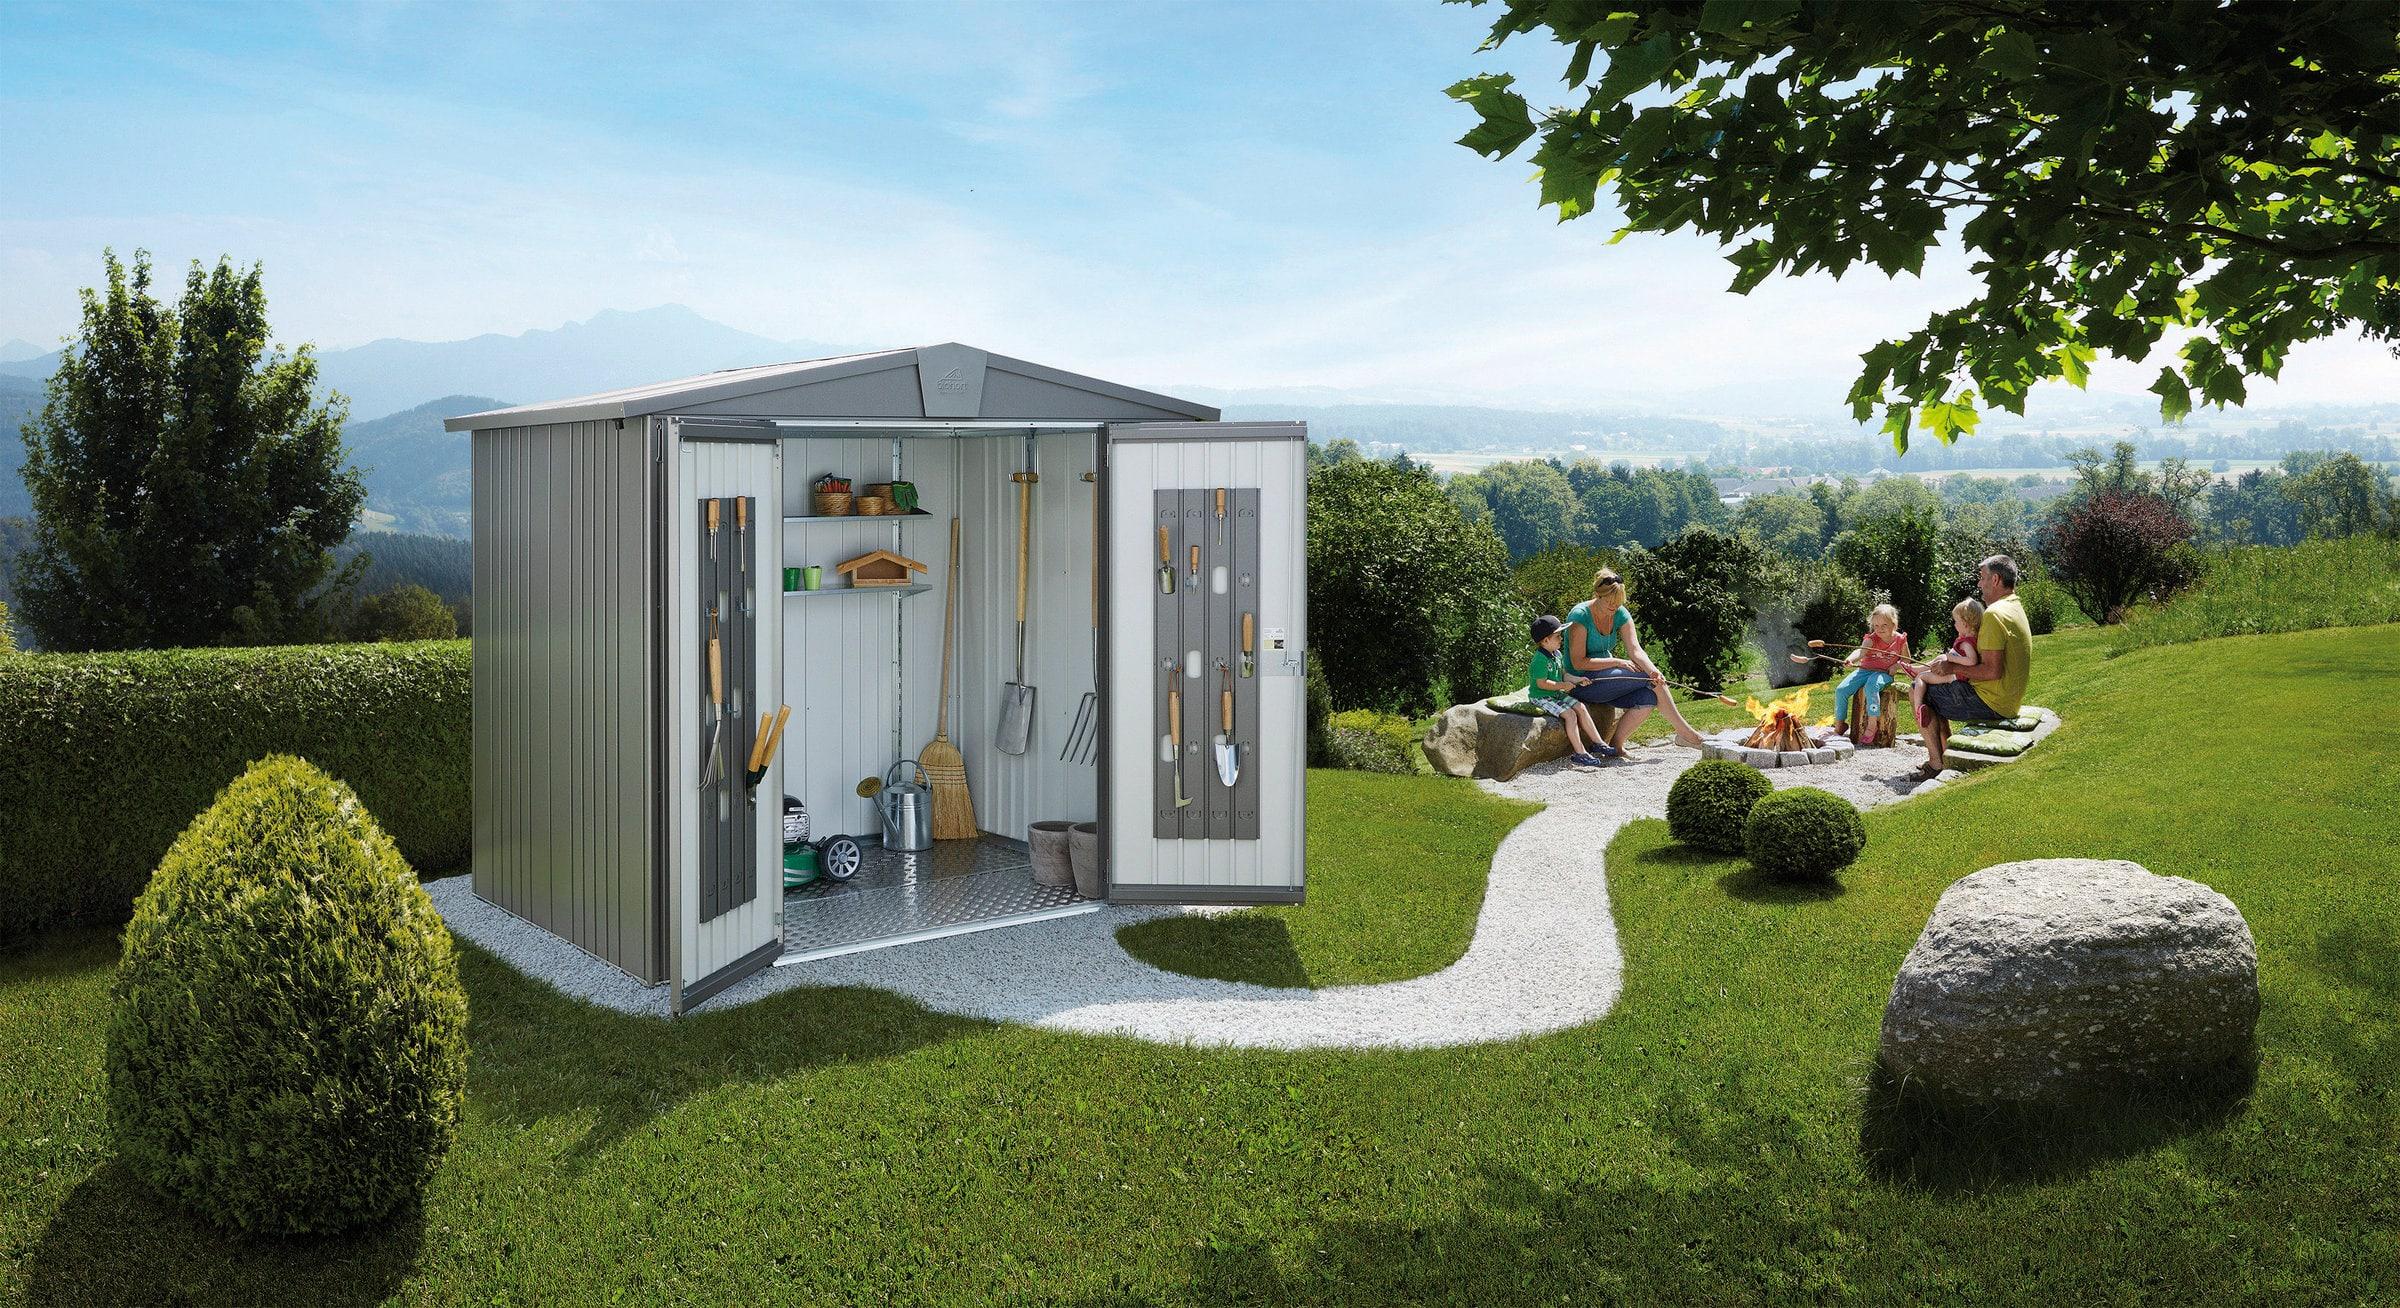 biohort casetta per attrezi europa 4 migros. Black Bedroom Furniture Sets. Home Design Ideas